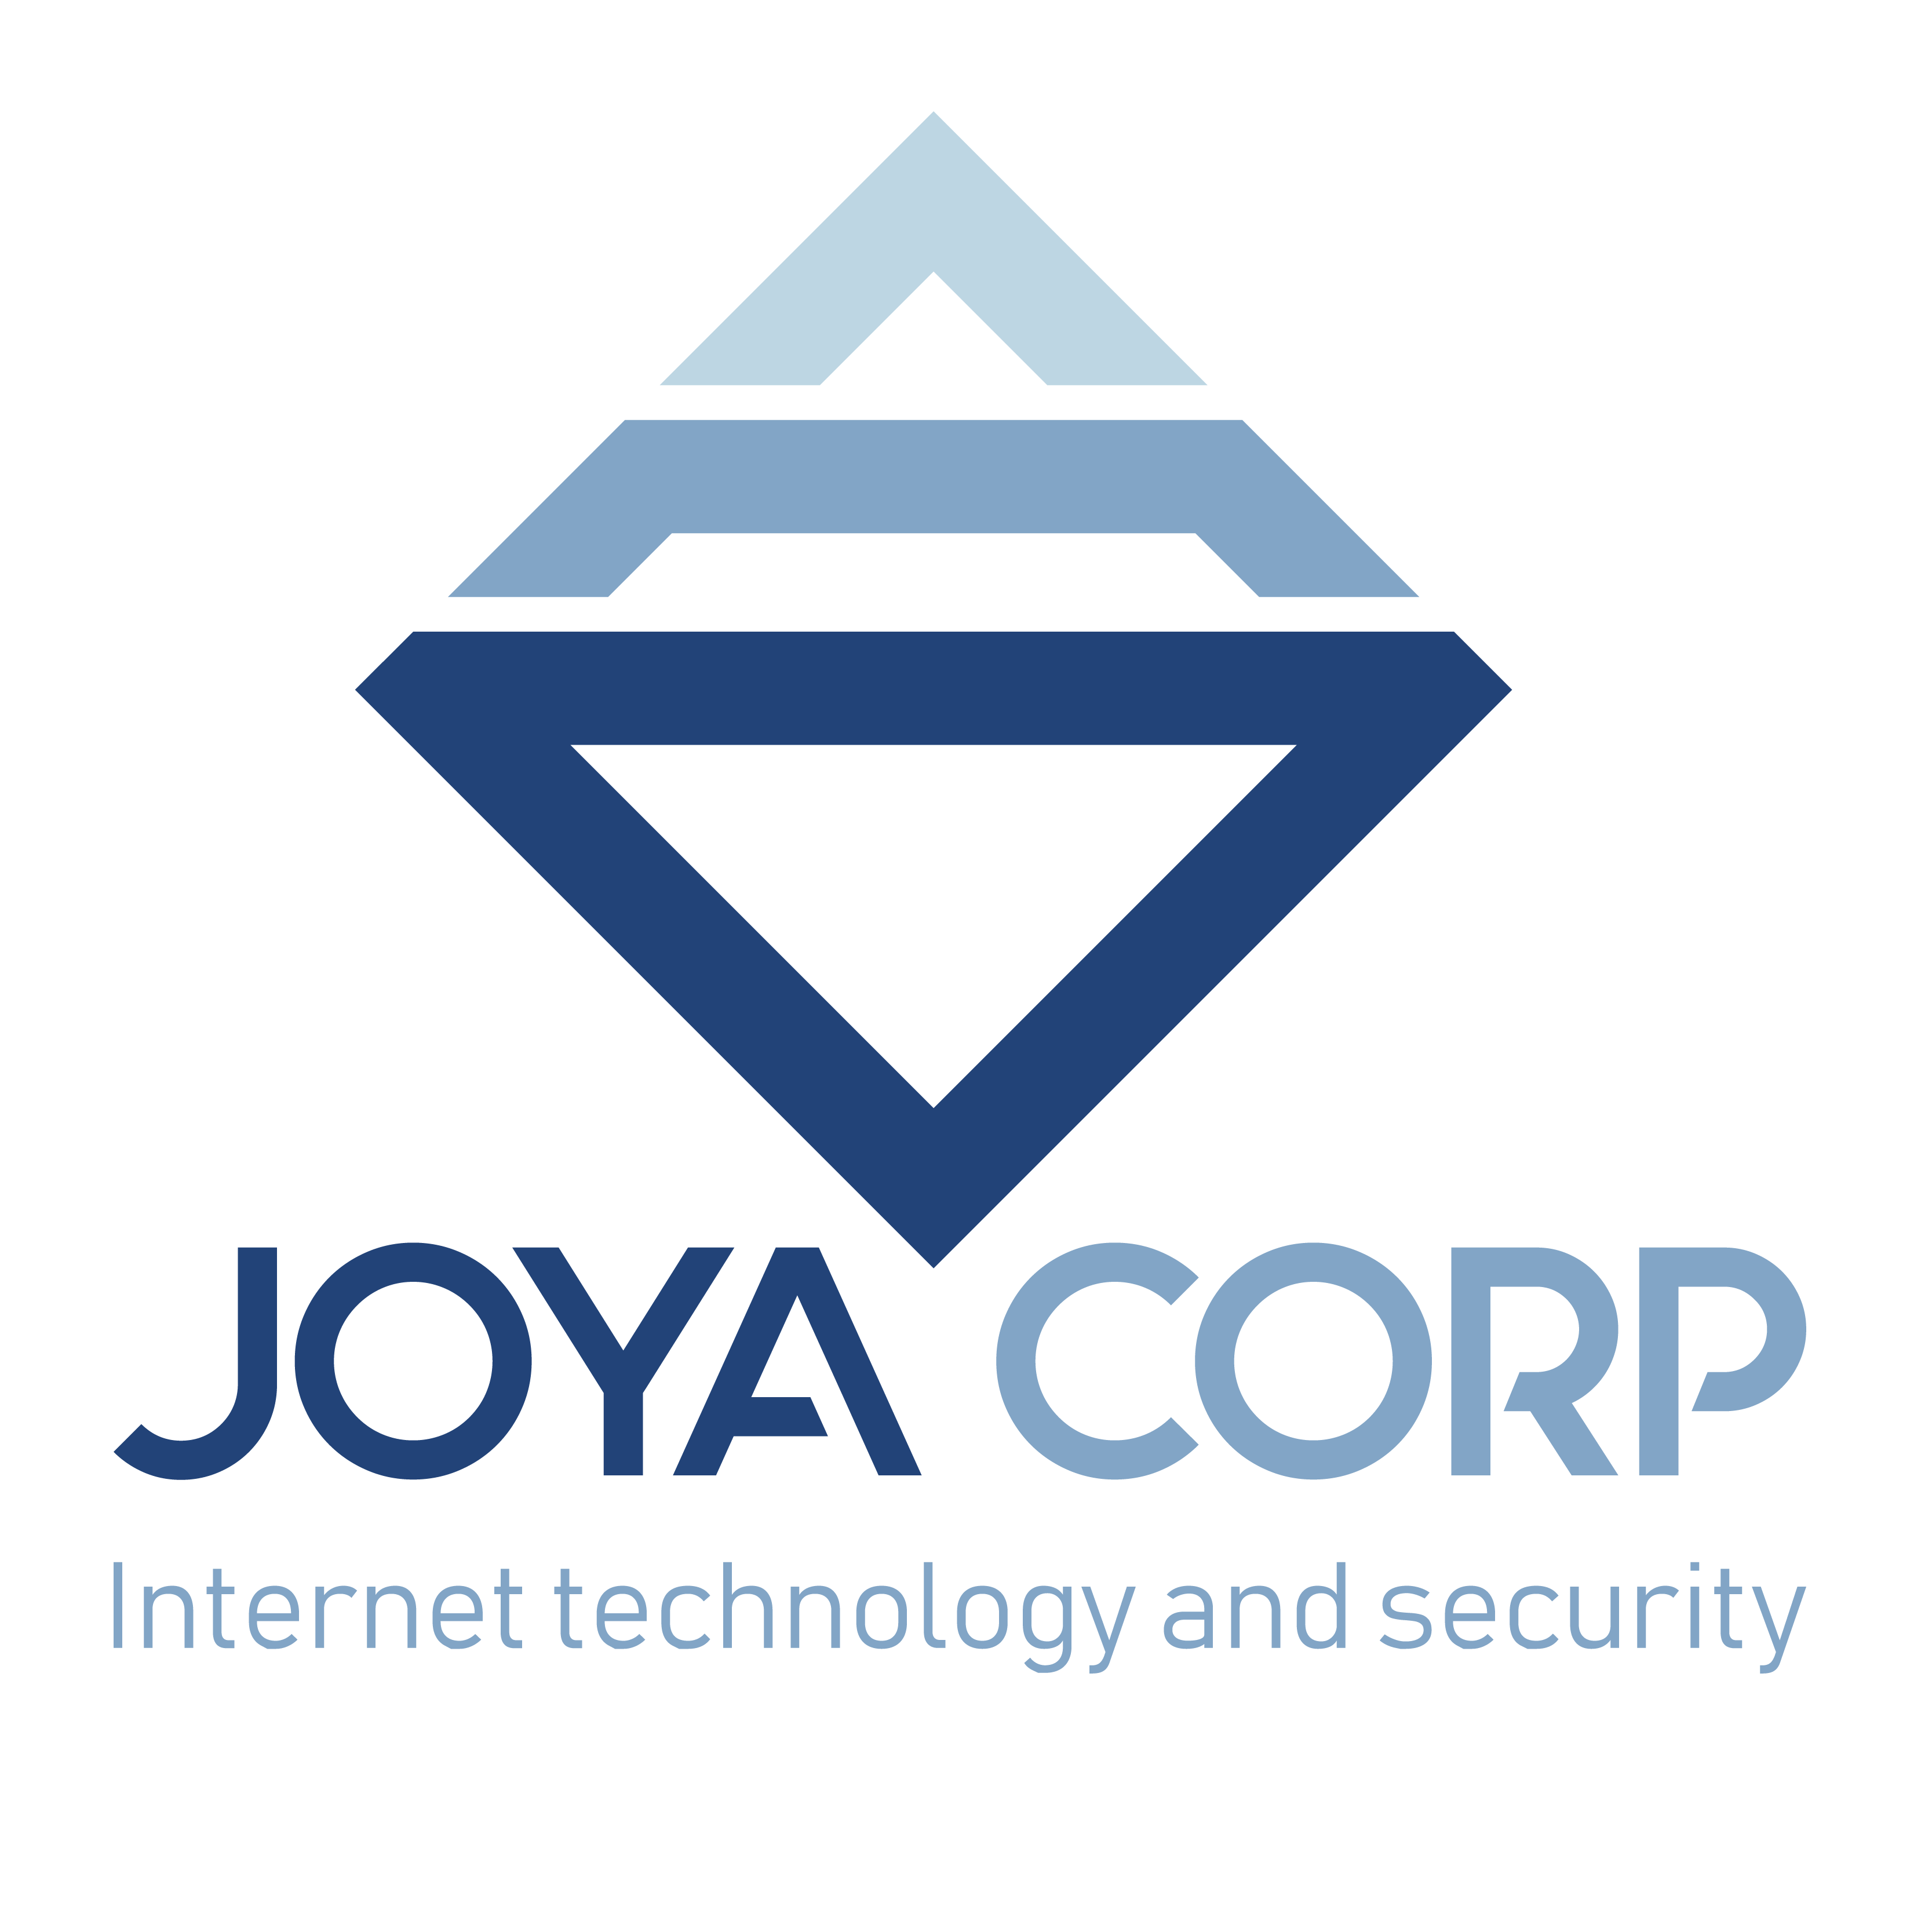 JoyaCorp